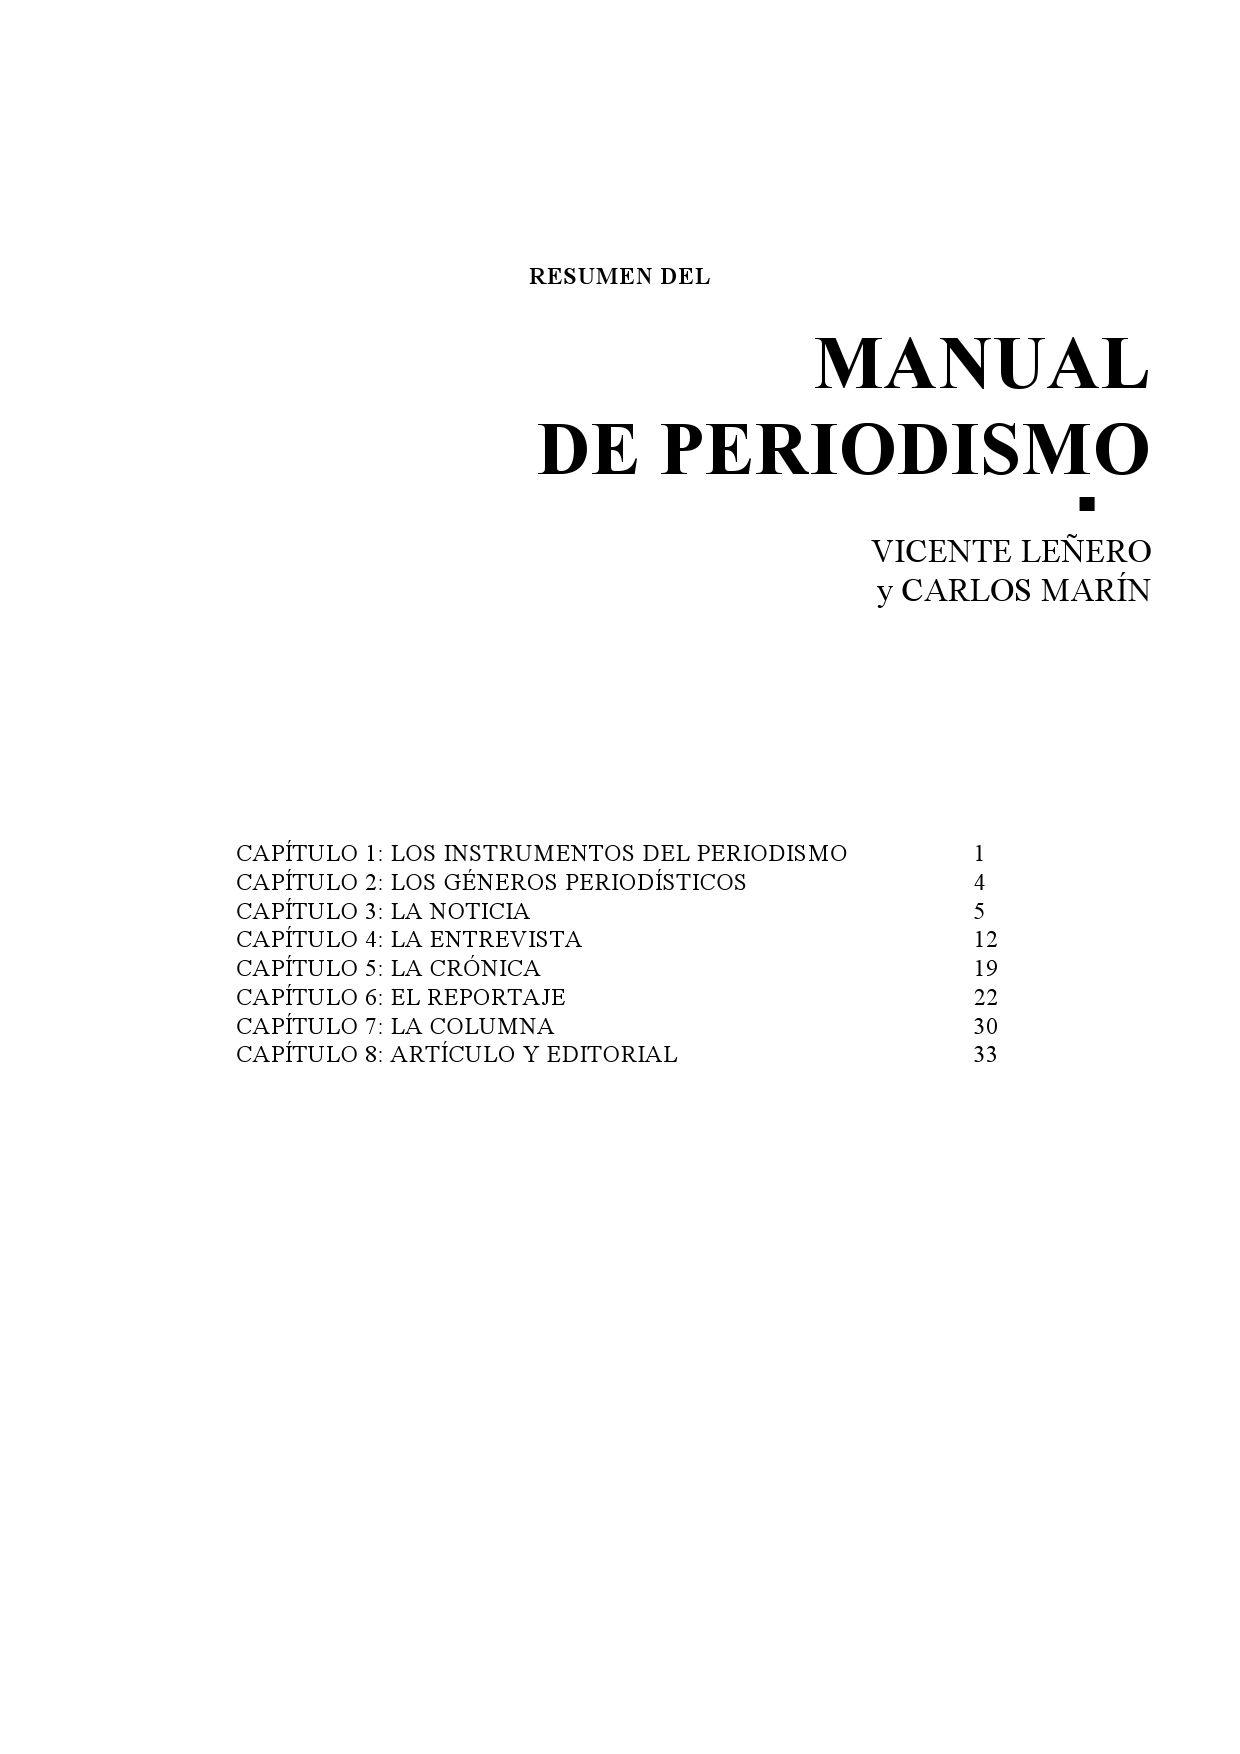 Resumen del MANUAL DE PERIODISMO by Héctor Montes - issuu